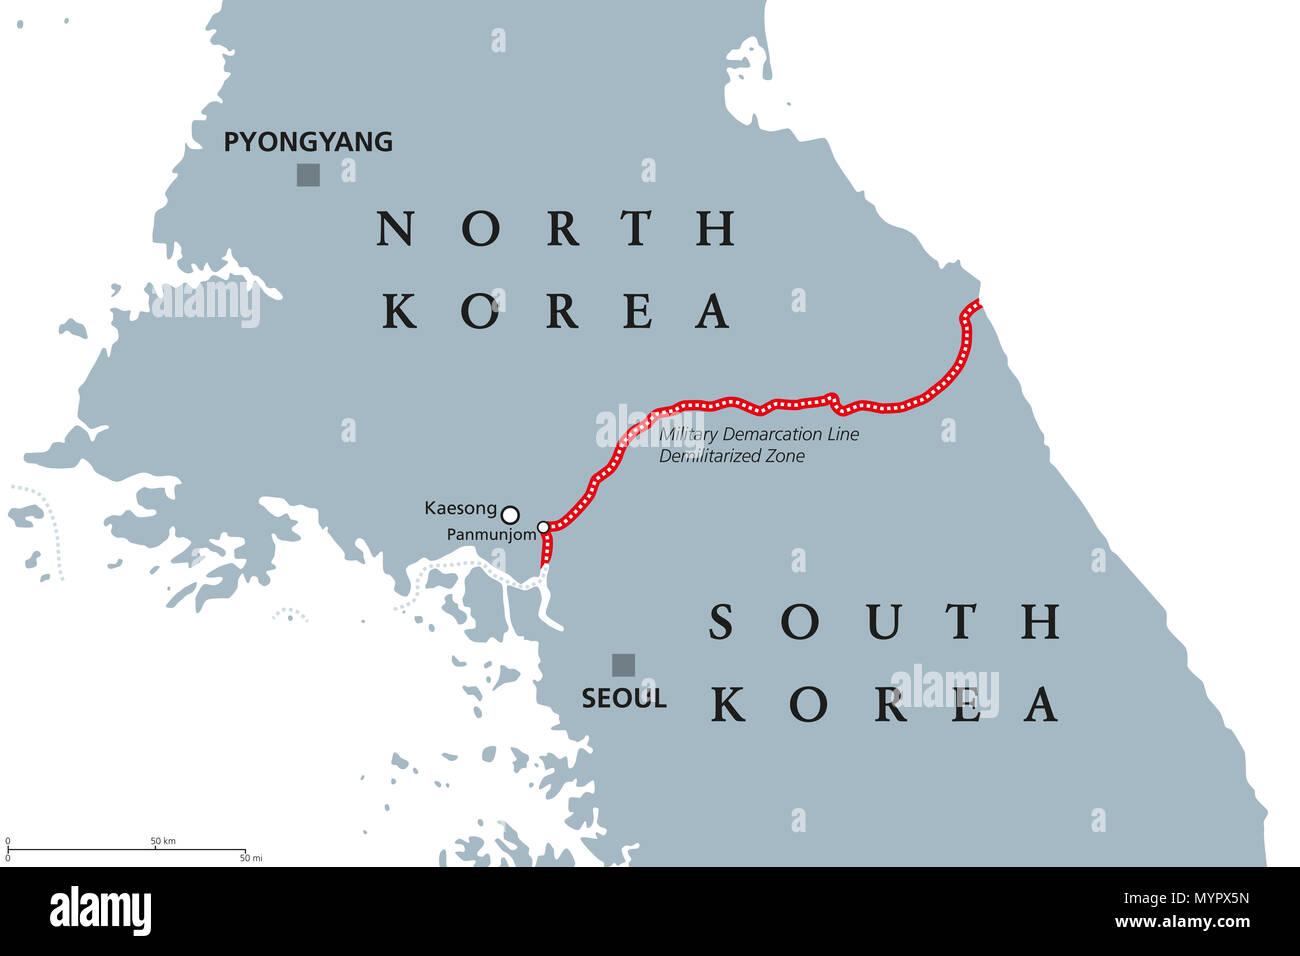 Korean Peninsula, Demilitarized Zone Area, political map. North and ...